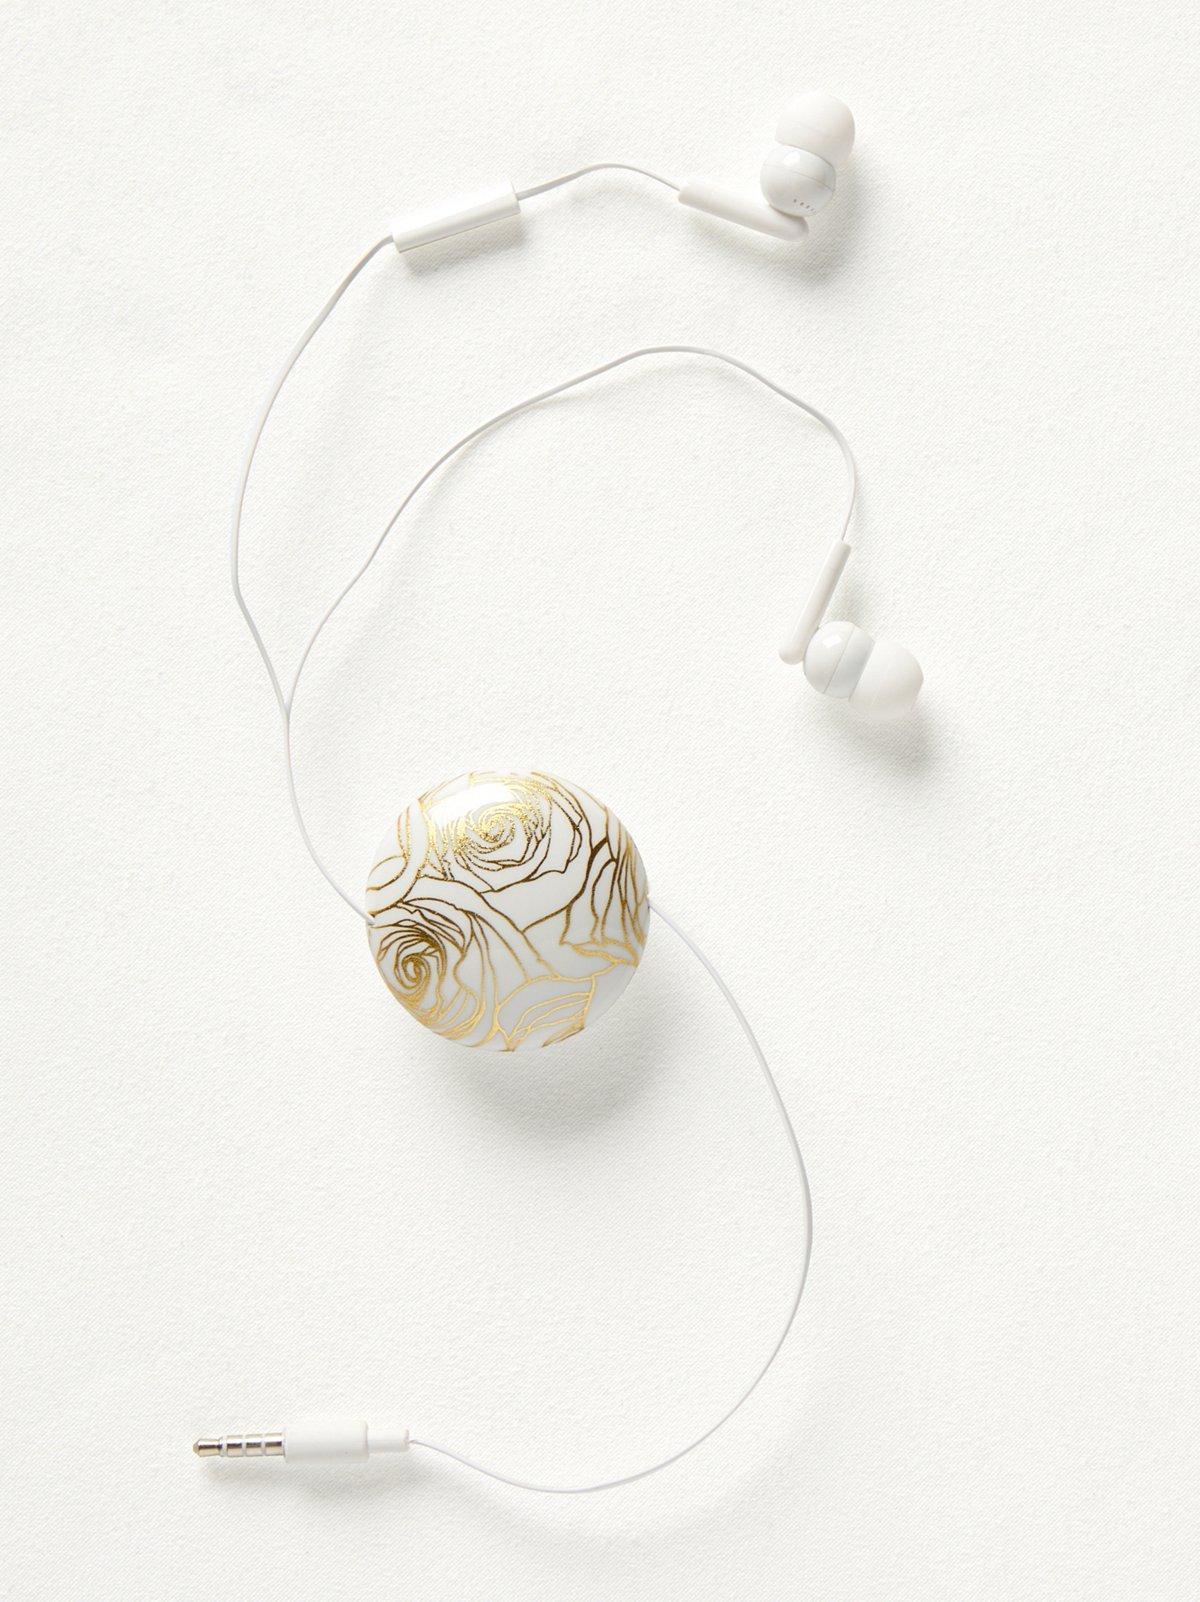 Smartbudz可伸缩耳机